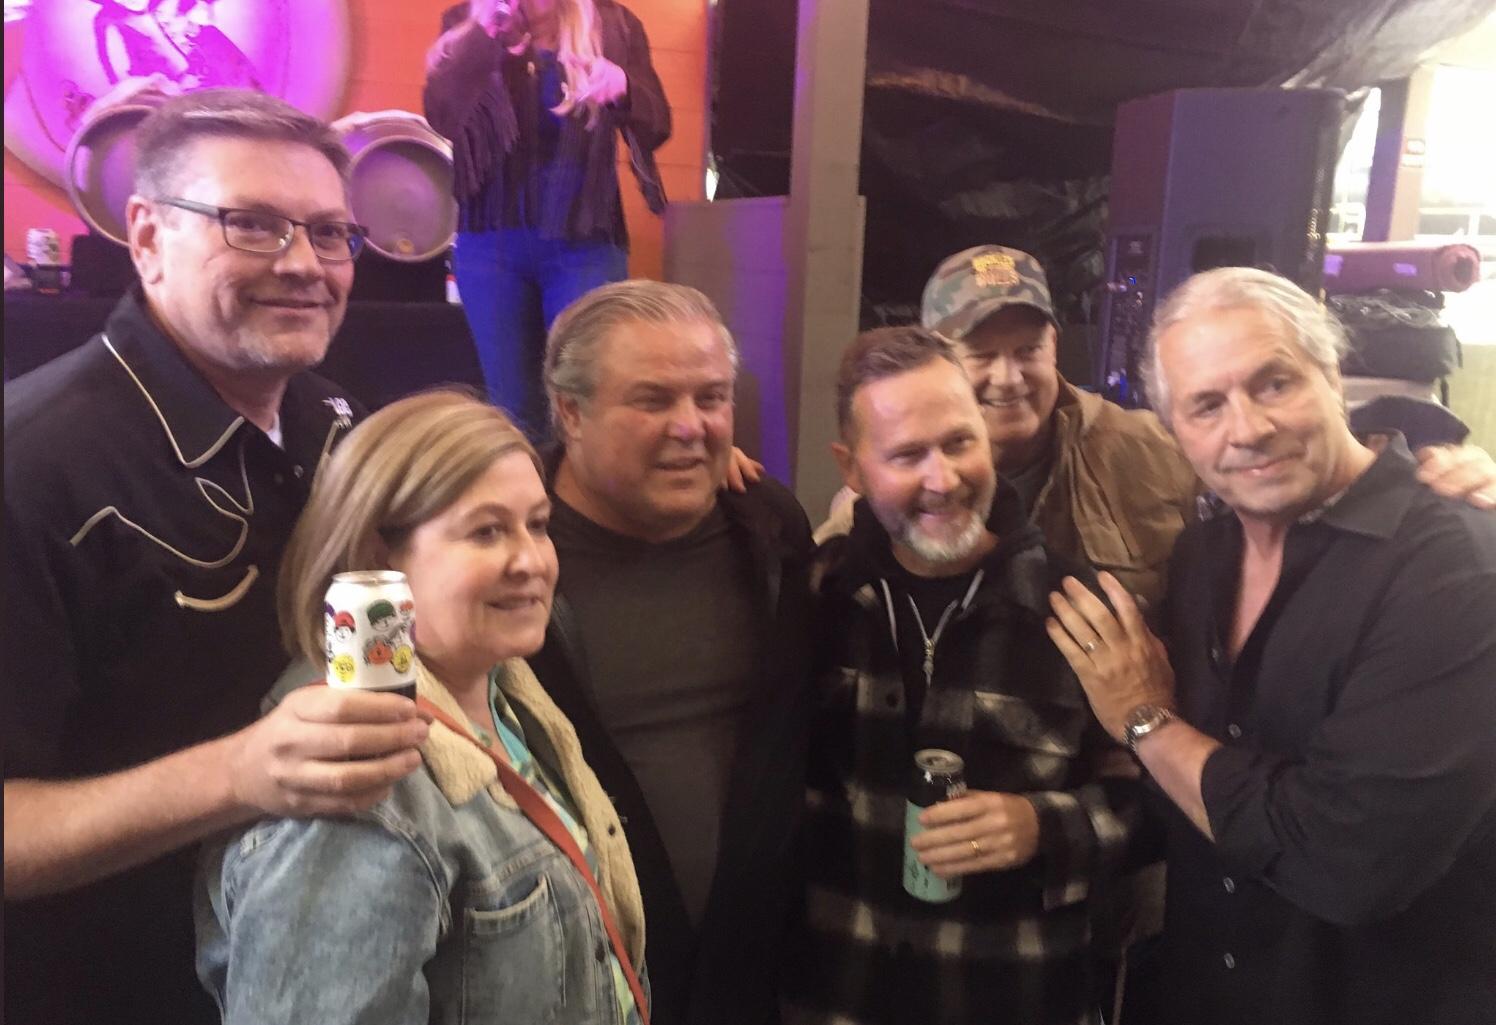 Left to Right: Tom Stuart , Pamela Heard, Tony Spoletini, Jim Button,Gerry Forbes Bret Hart.